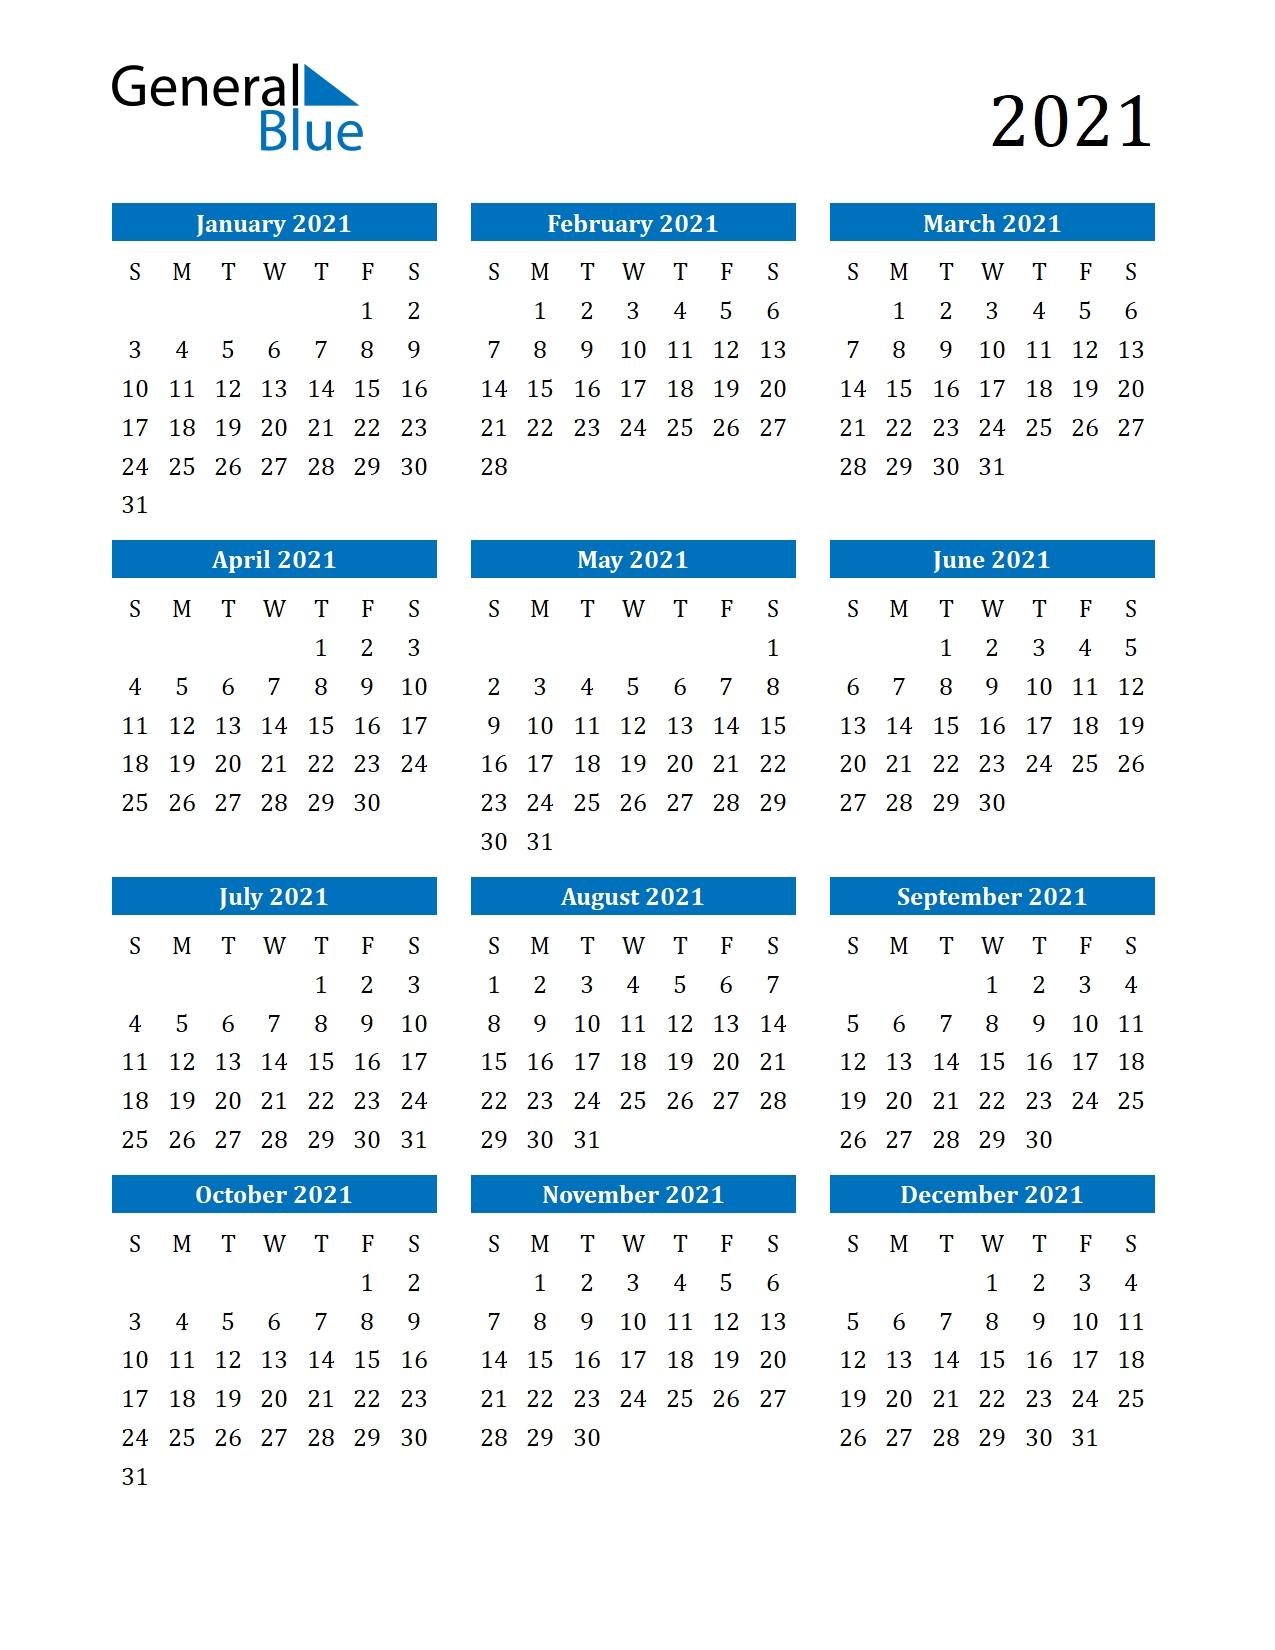 Take 2021 Weekly Calendar